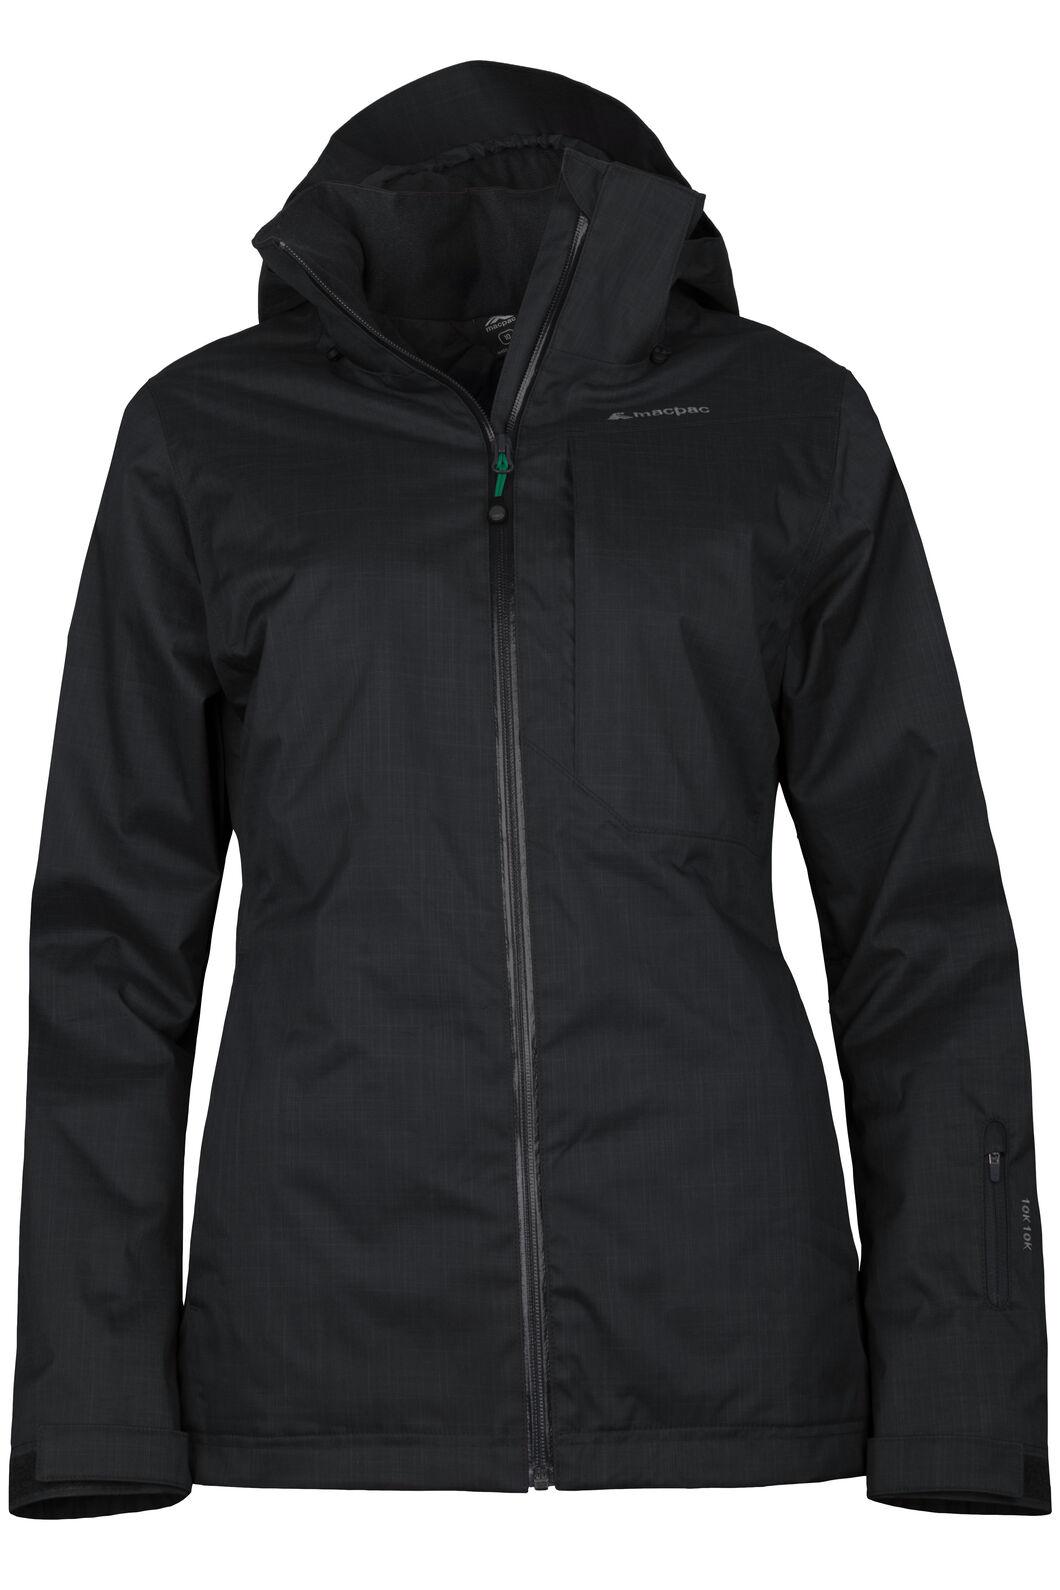 Powder Ski Jacket - Women's, Black/Black, hi-res